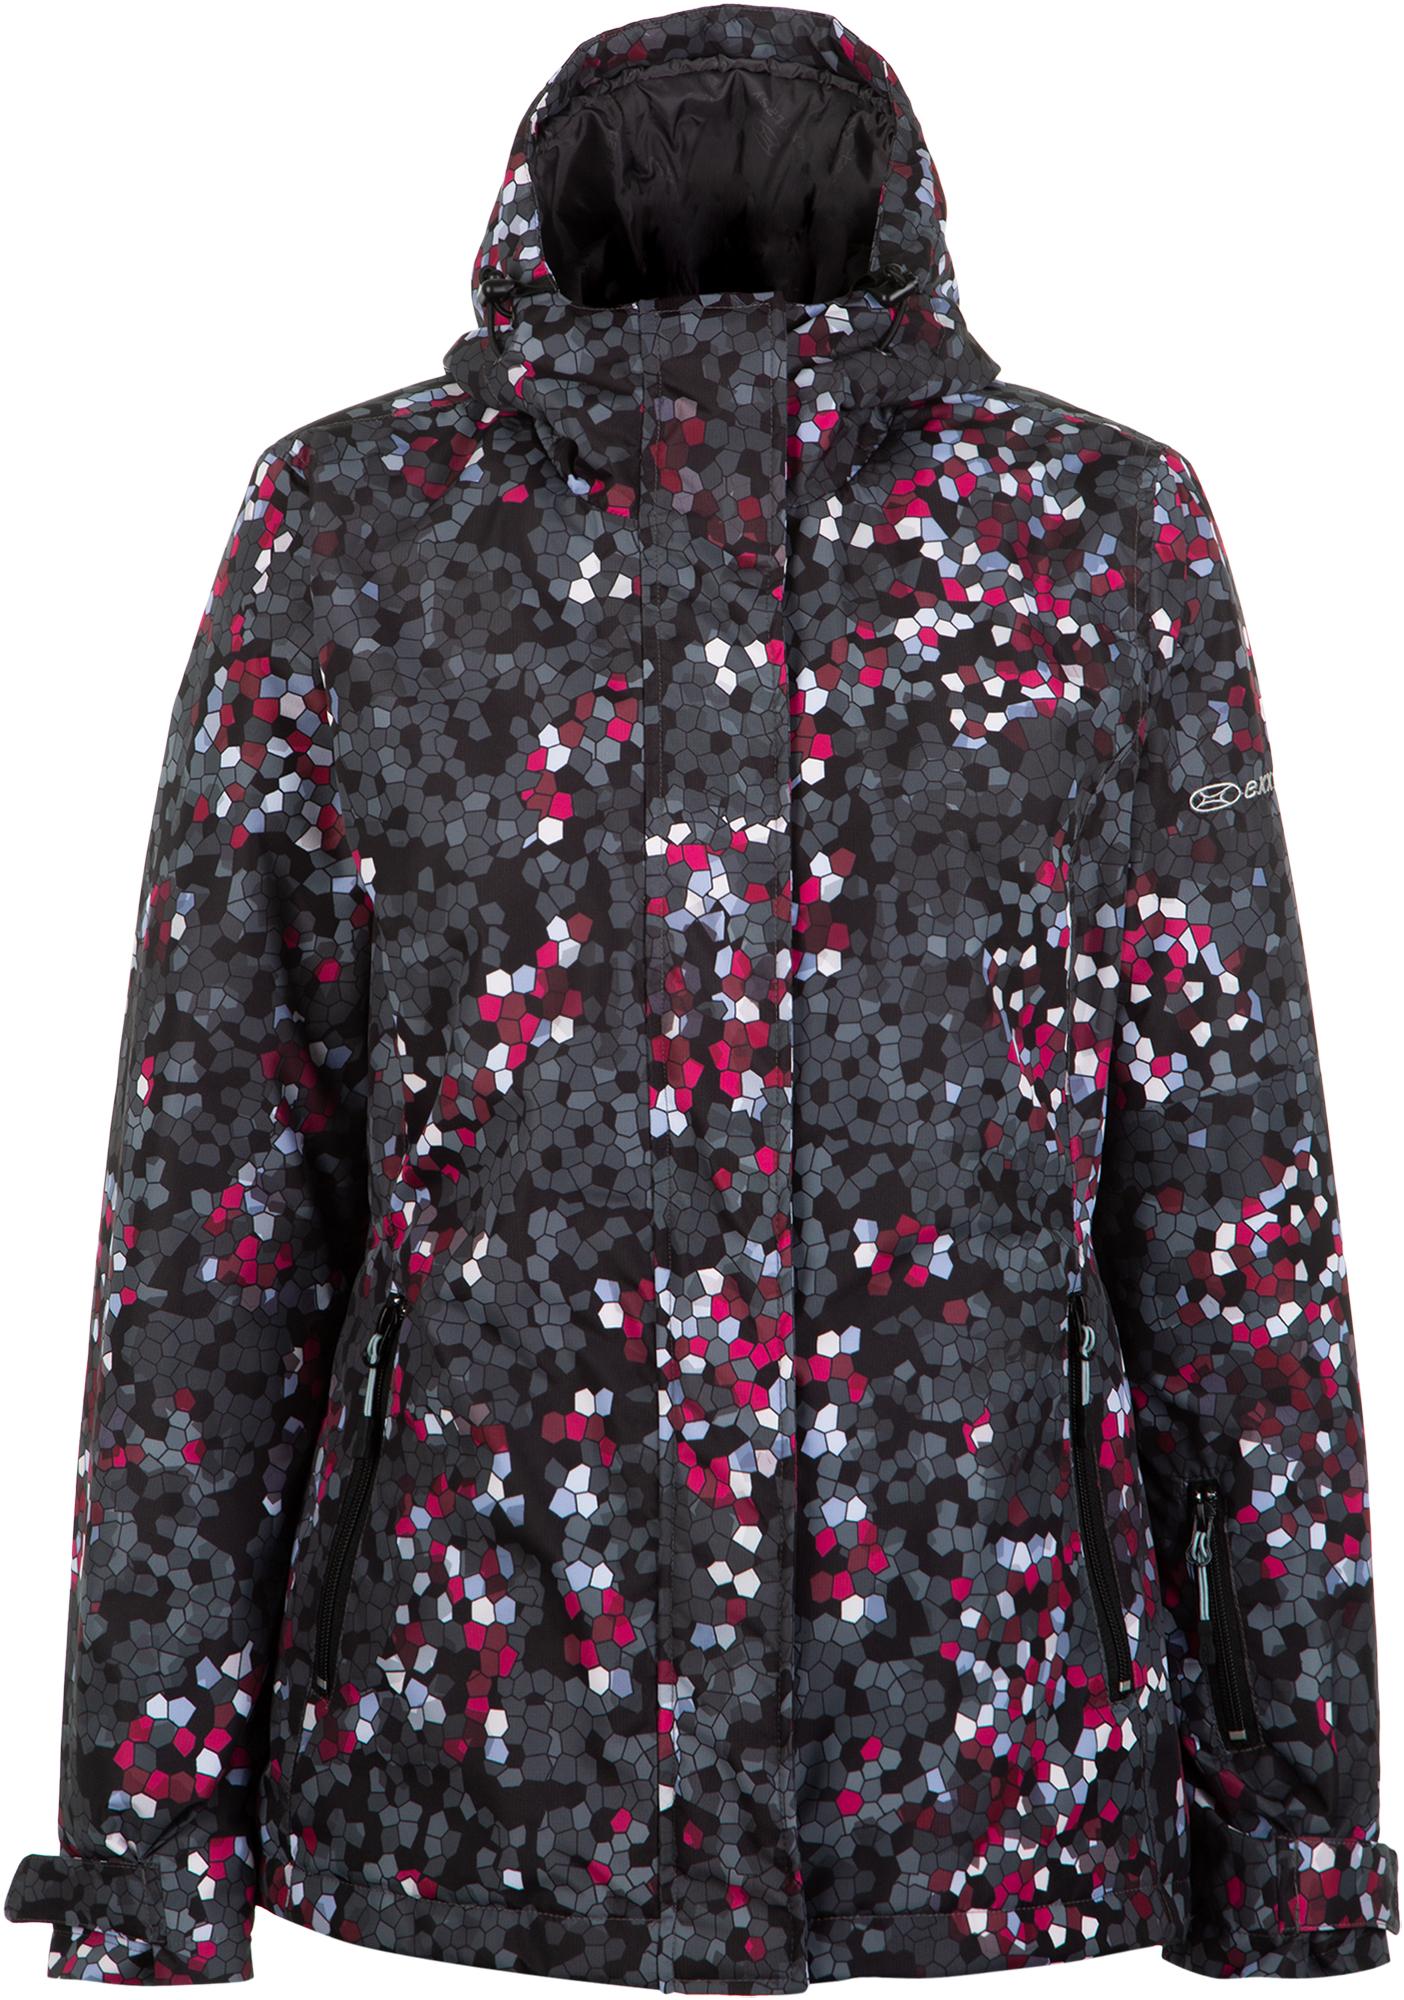 цена на Exxtasy Куртка утепленная женская Exxtasy Stavanger, размер 42